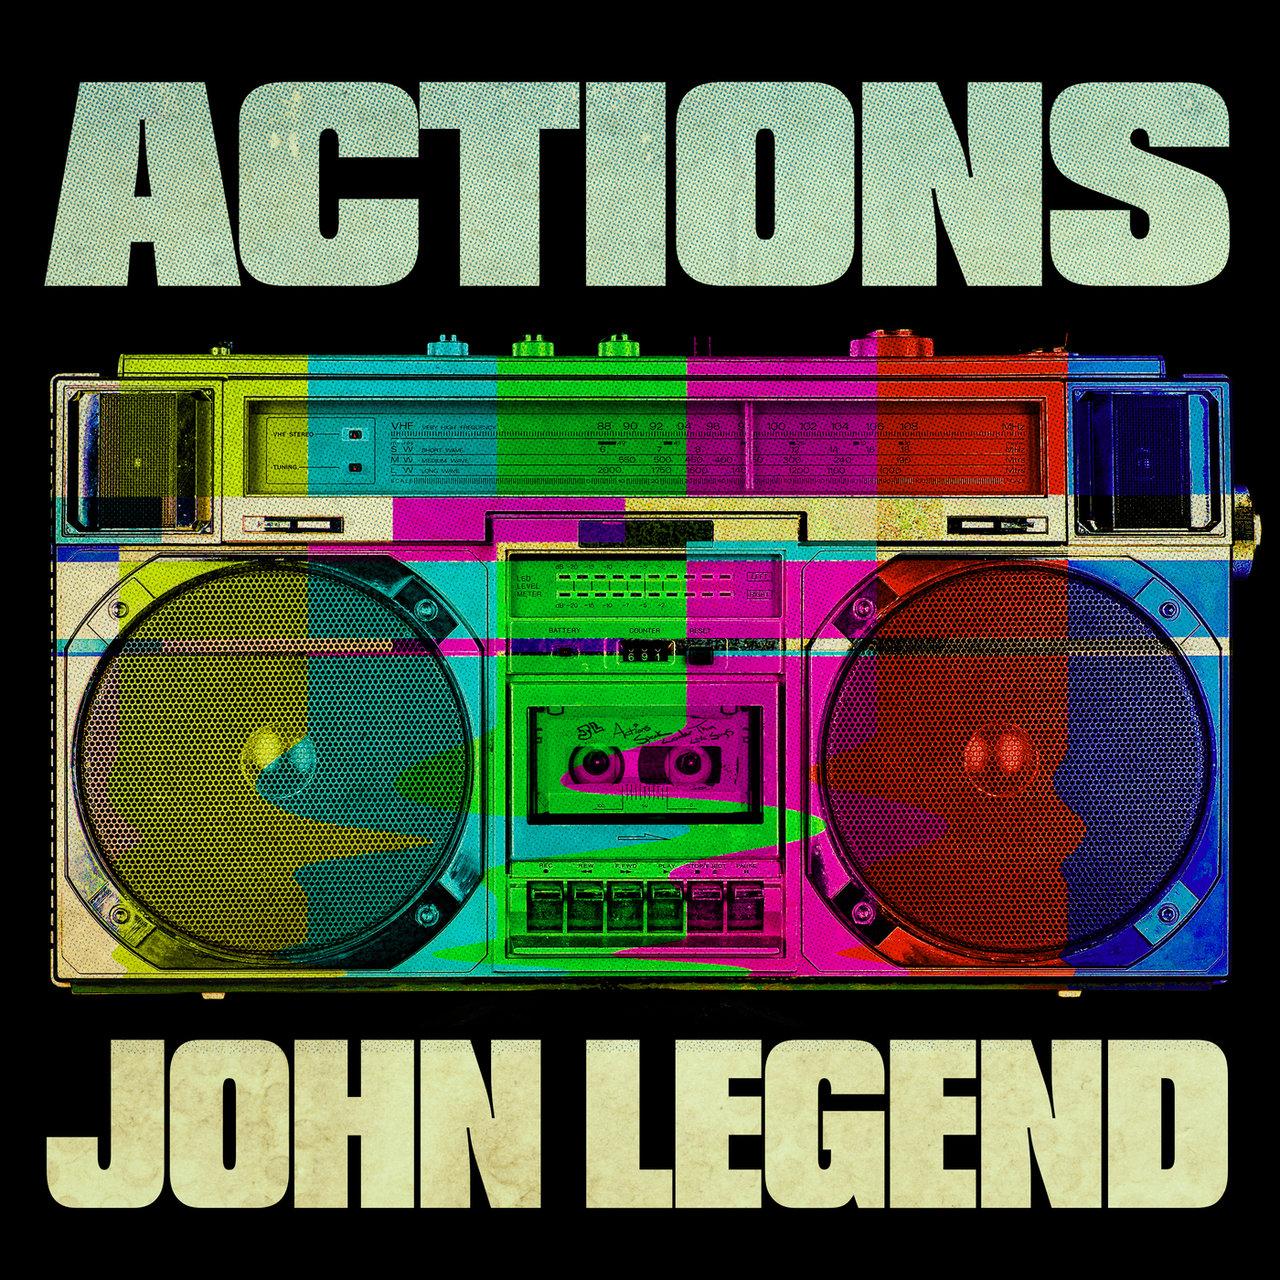 John Legend - Actions (Cover)